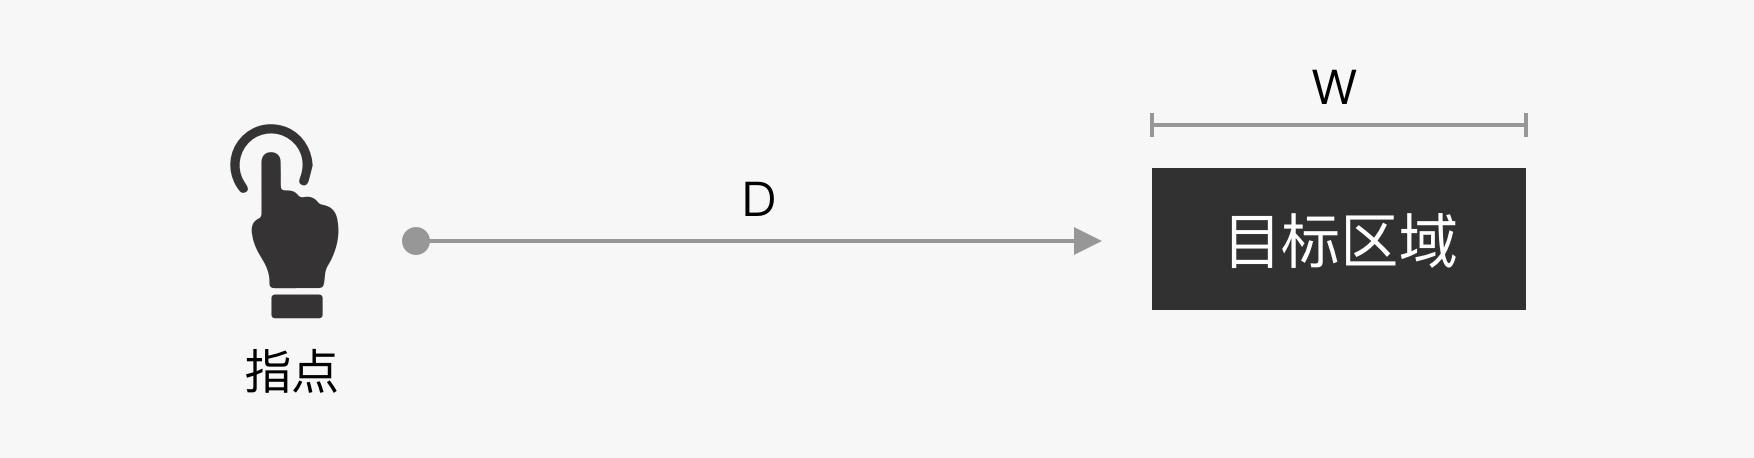 B端产品界面高屏效初探